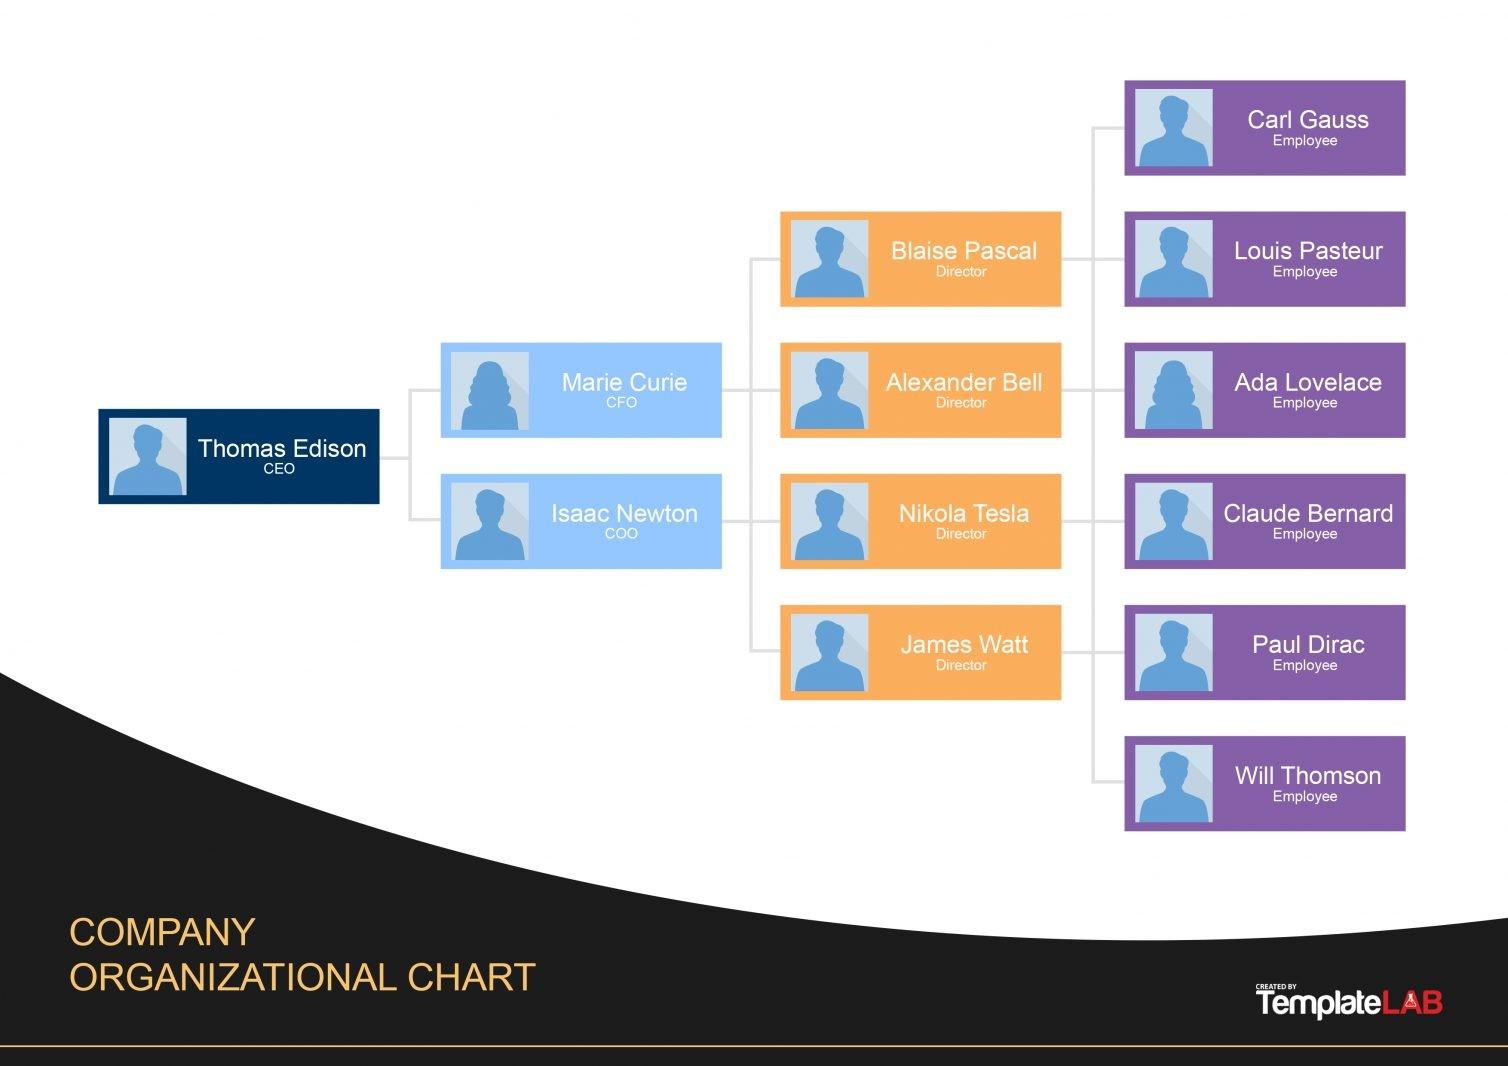 Organization Chart Template Word from templatelab.com